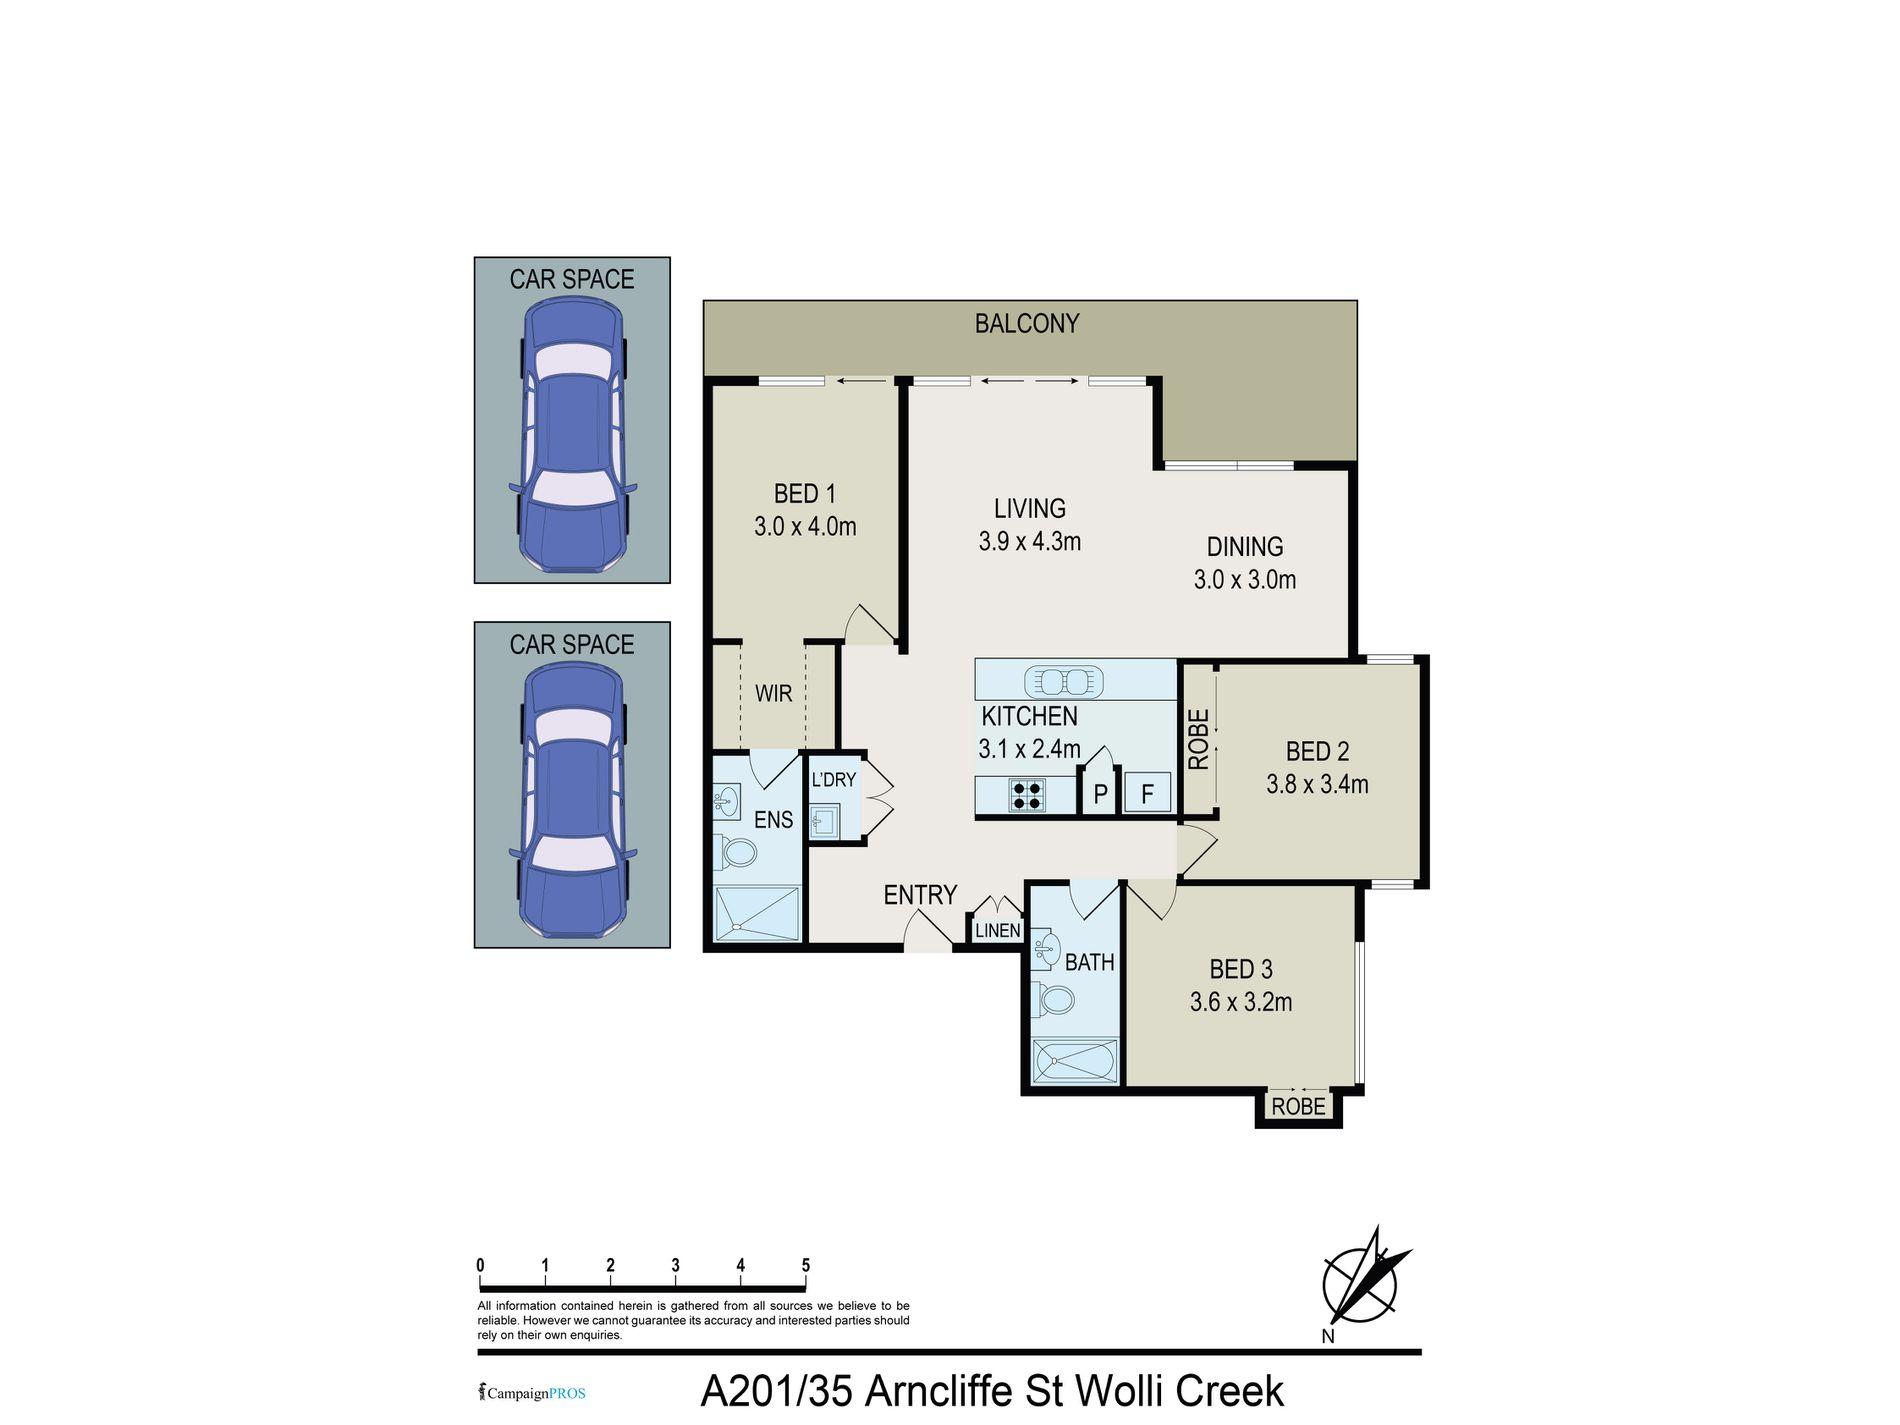 A201 / 35 Arncliffe Street, Wolli Creek